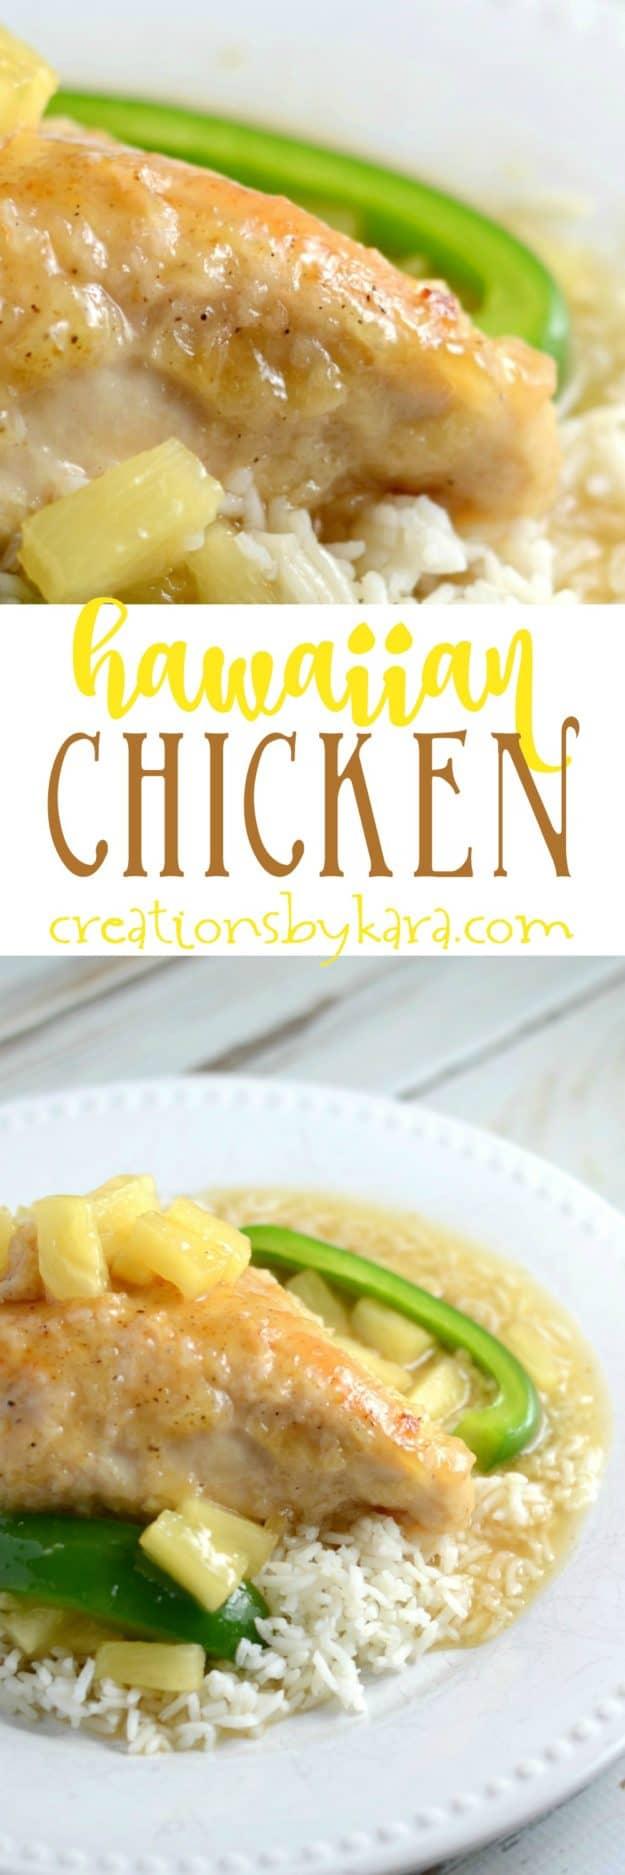 Hawaiian Chicken Recipe Food Network